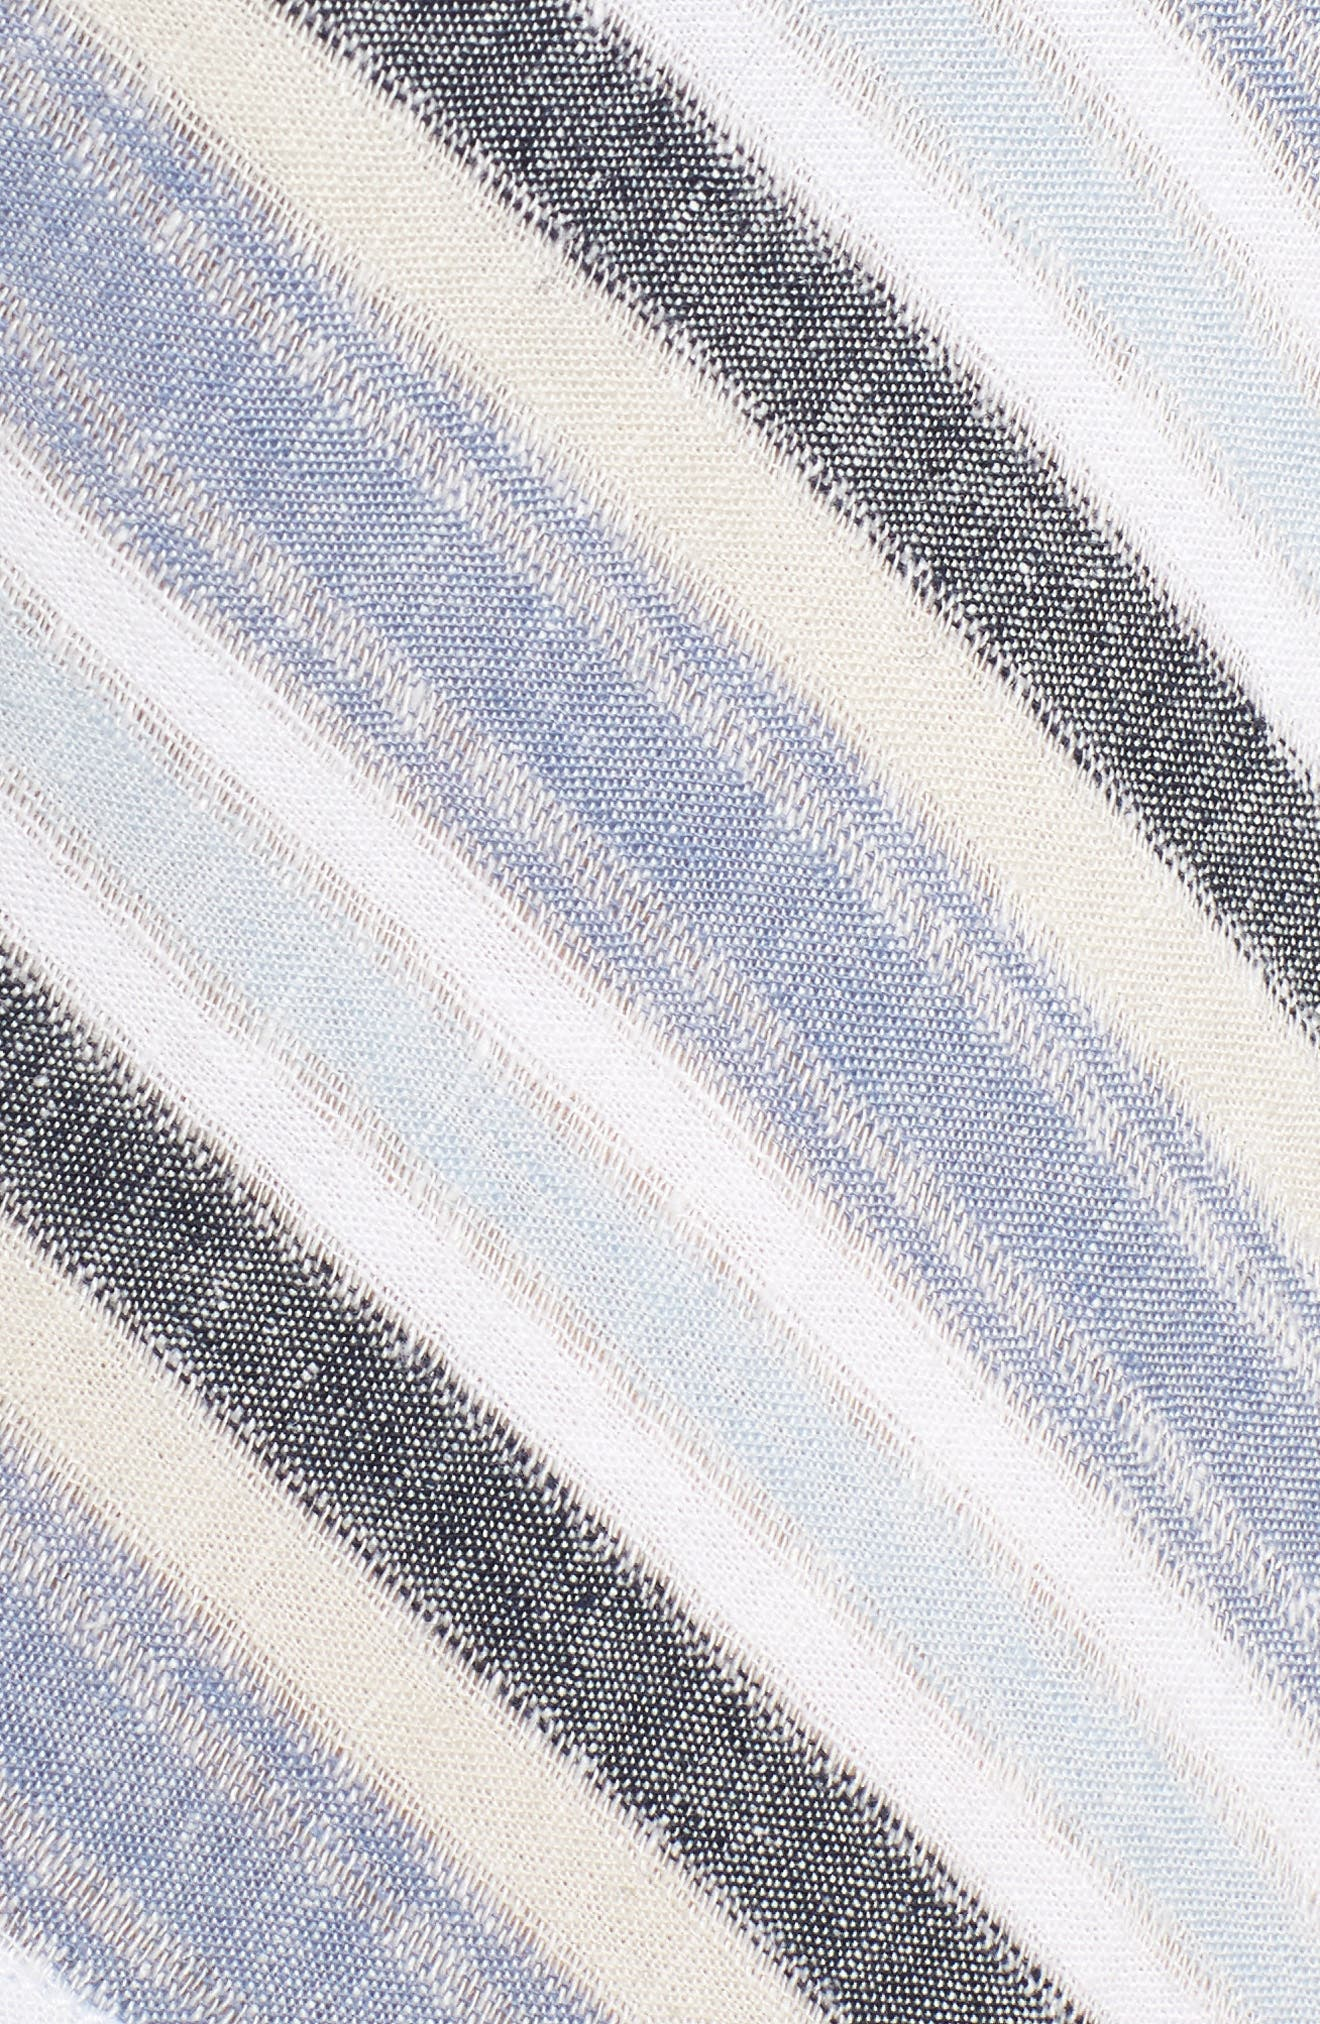 Stripe A-Line Maxi Dress,                             Alternate thumbnail 5, color,                             420